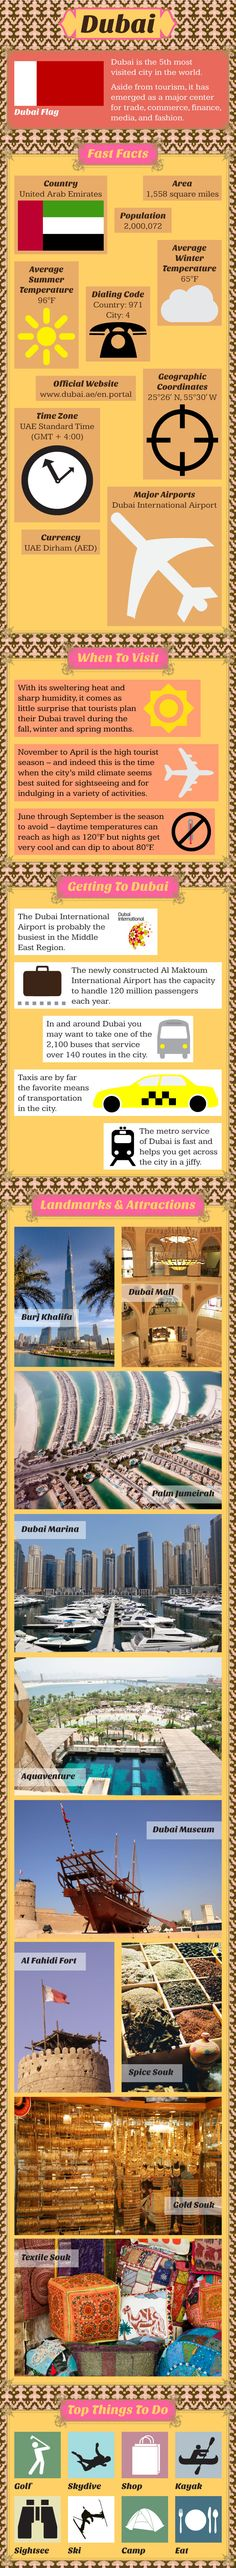 Dubai Travel Infographic